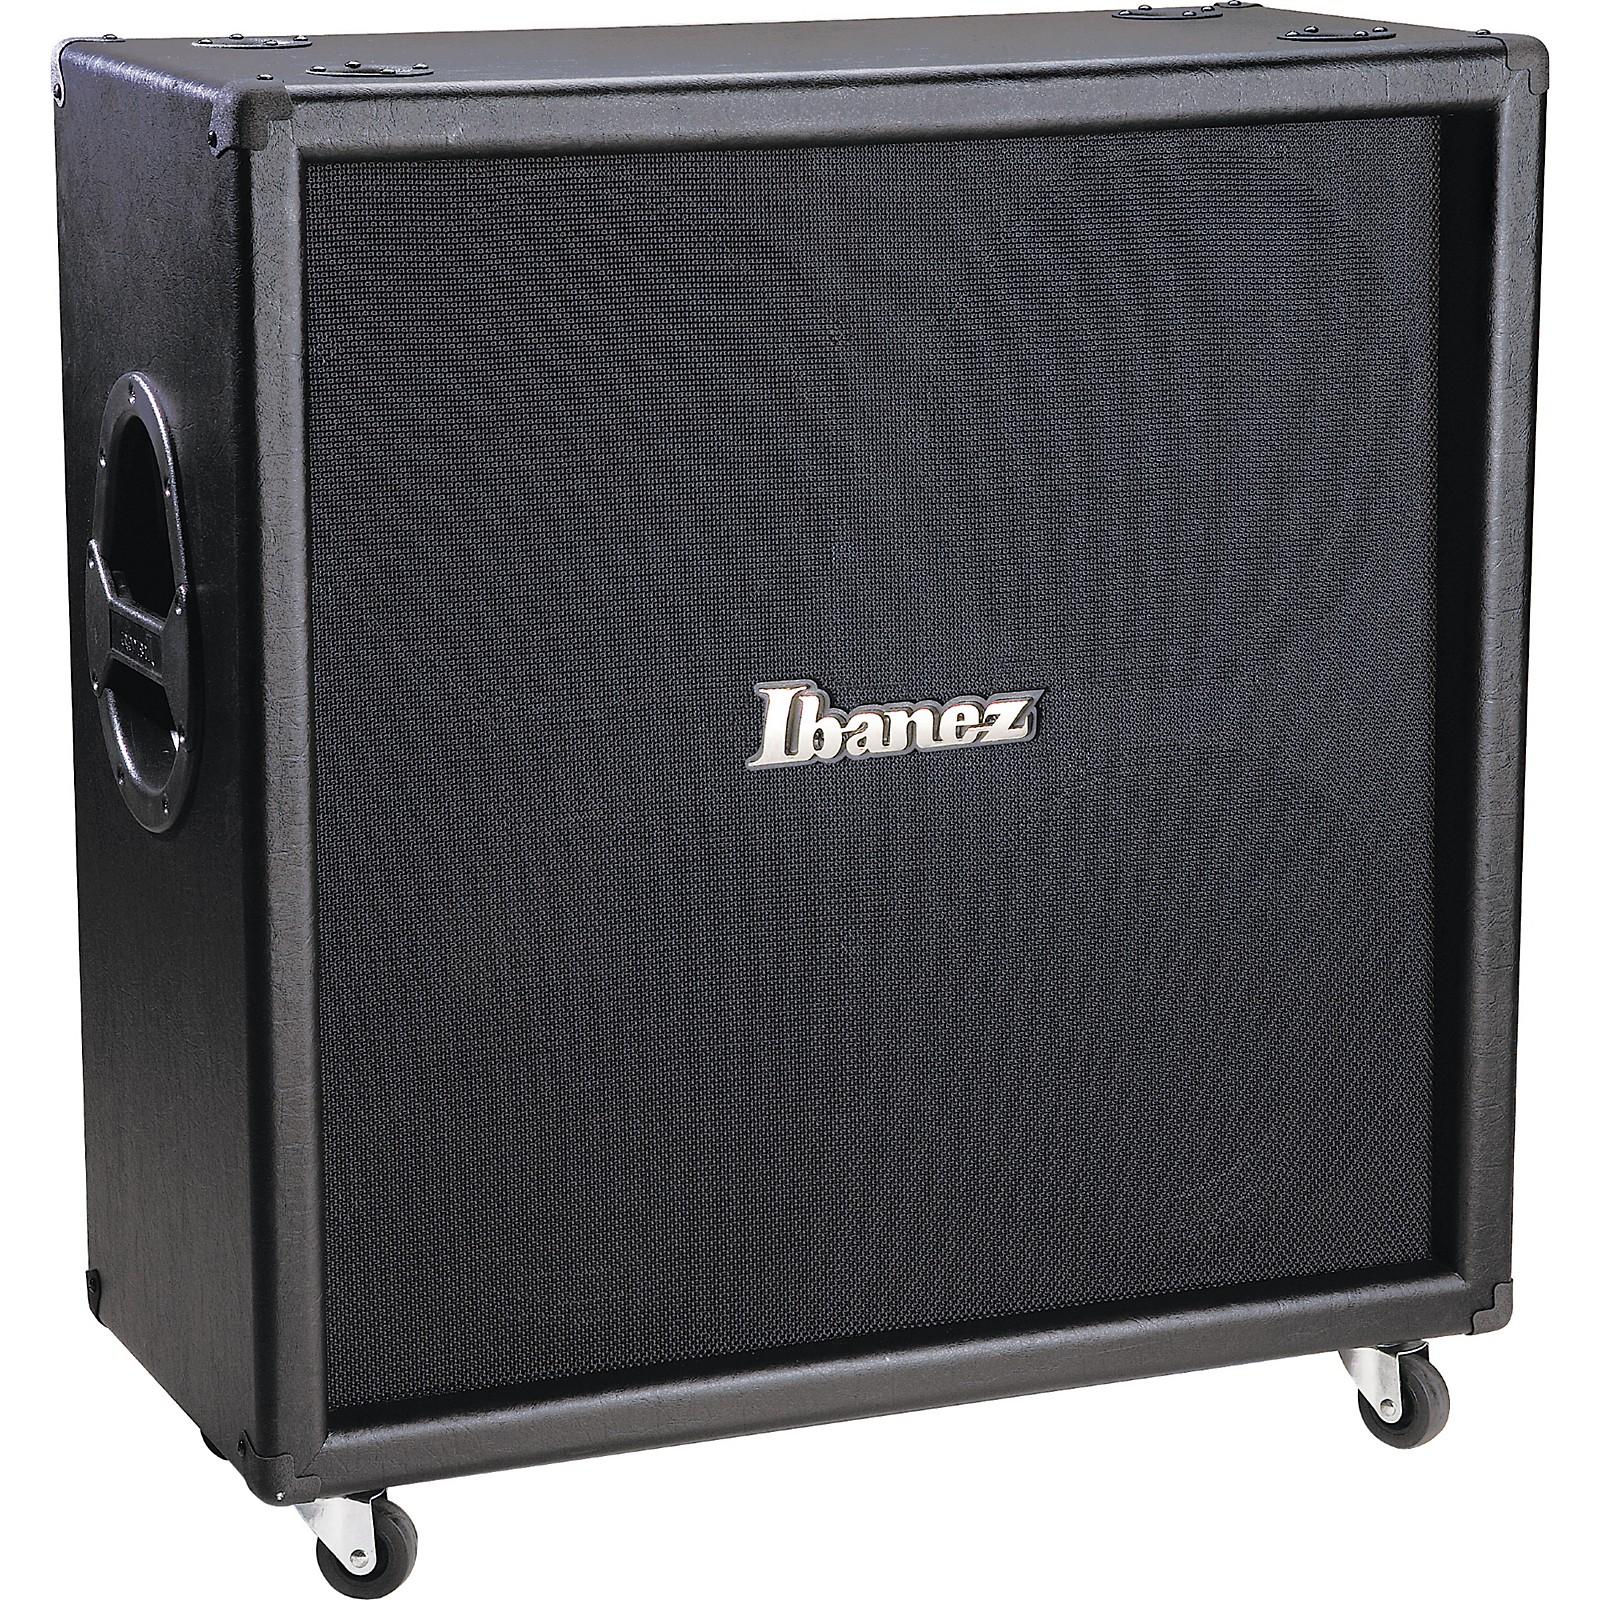 Ibanez IS412C 4x12